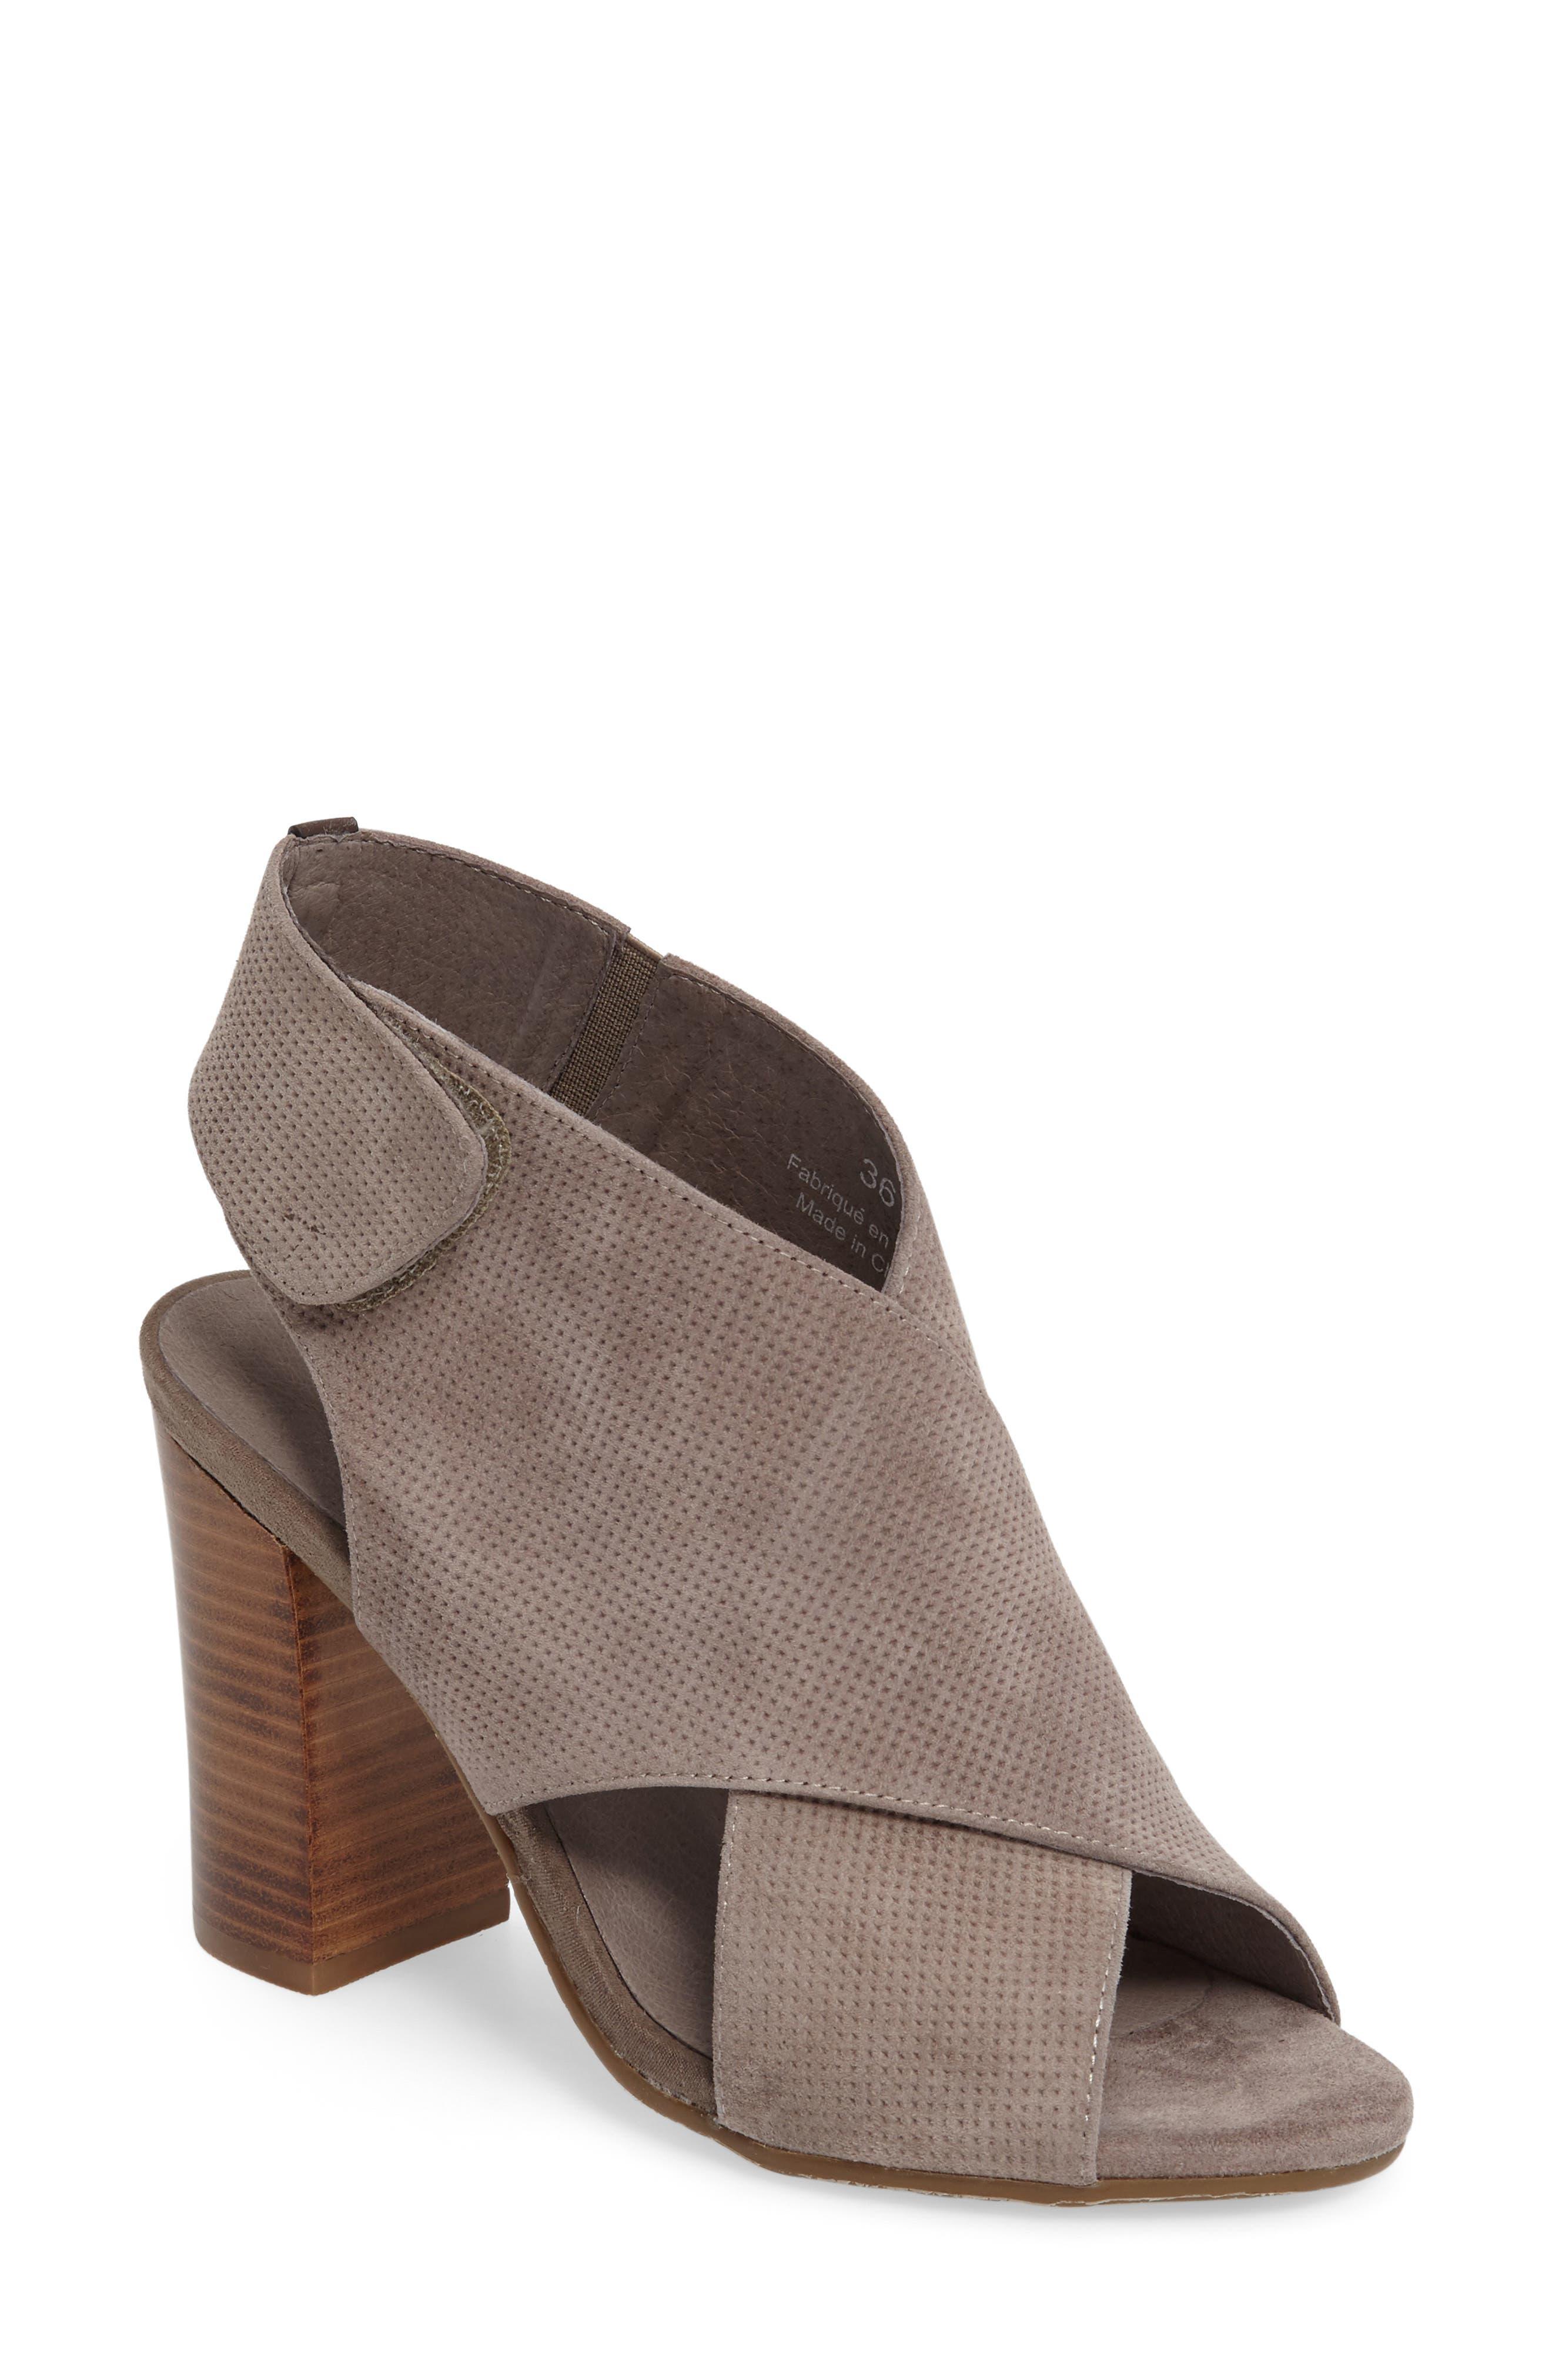 Alternate Image 1 Selected - Rudsak Benedetta Block Heel Sandal (Women)